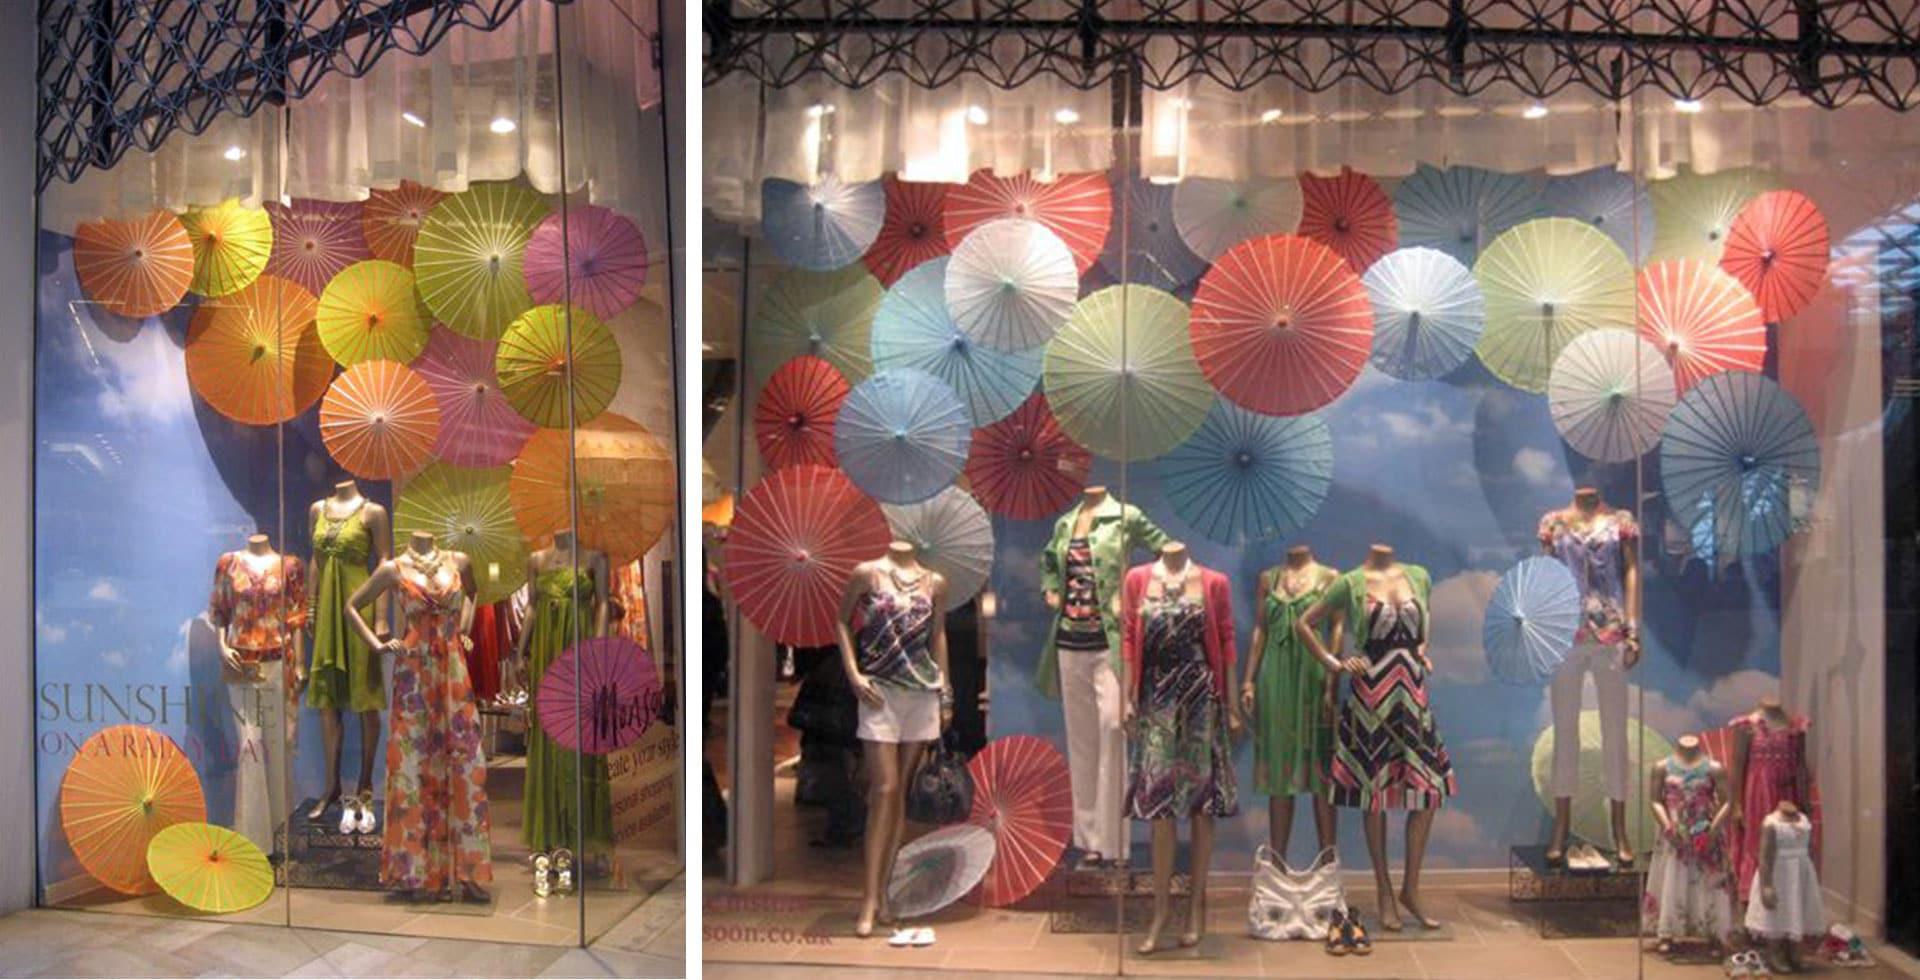 Monsoon parasol windows